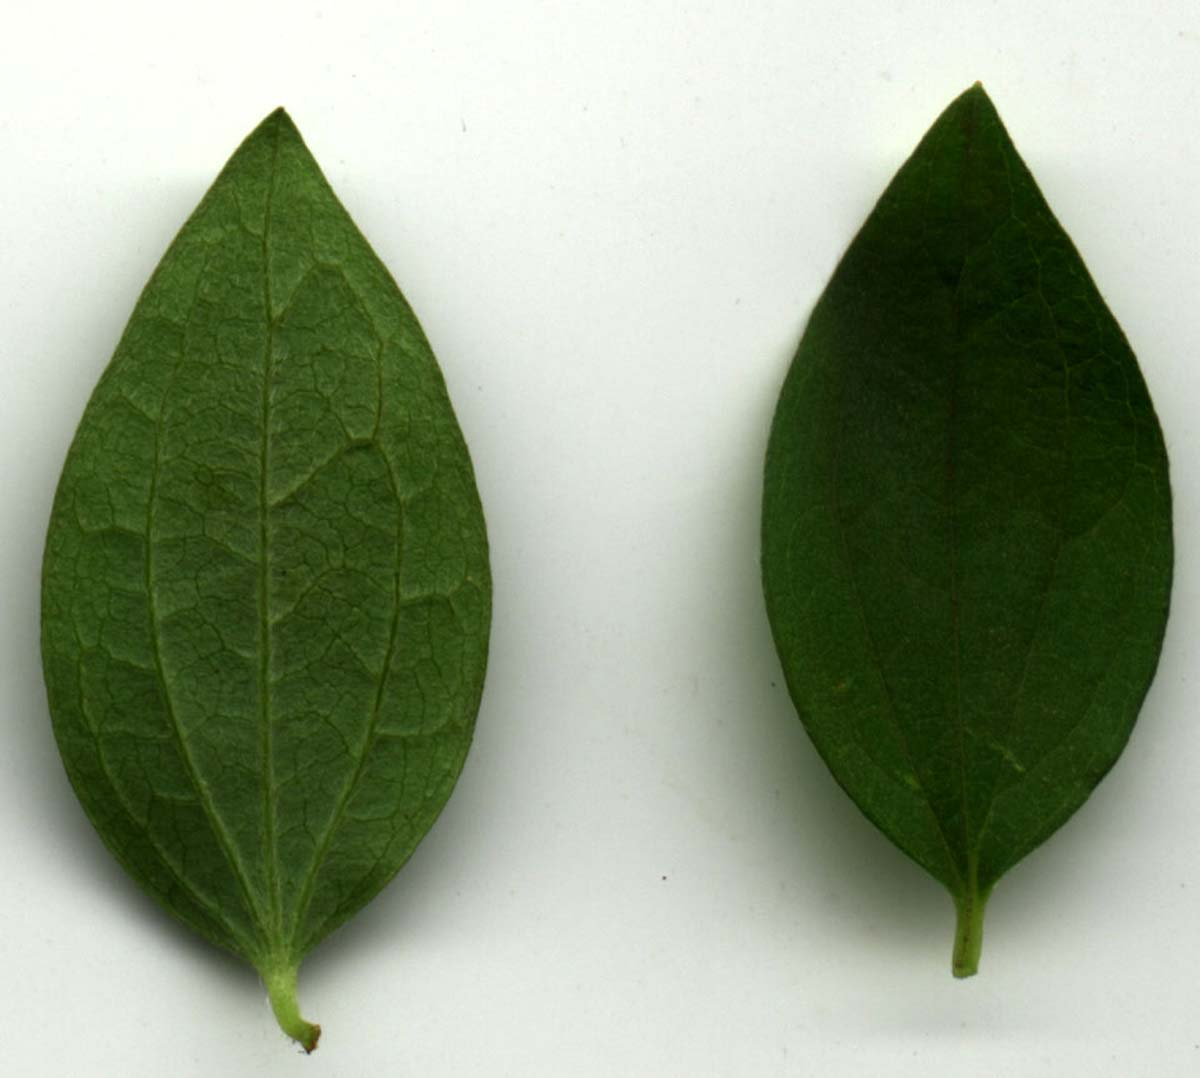 philadelphus-microphyllus-03.jpg